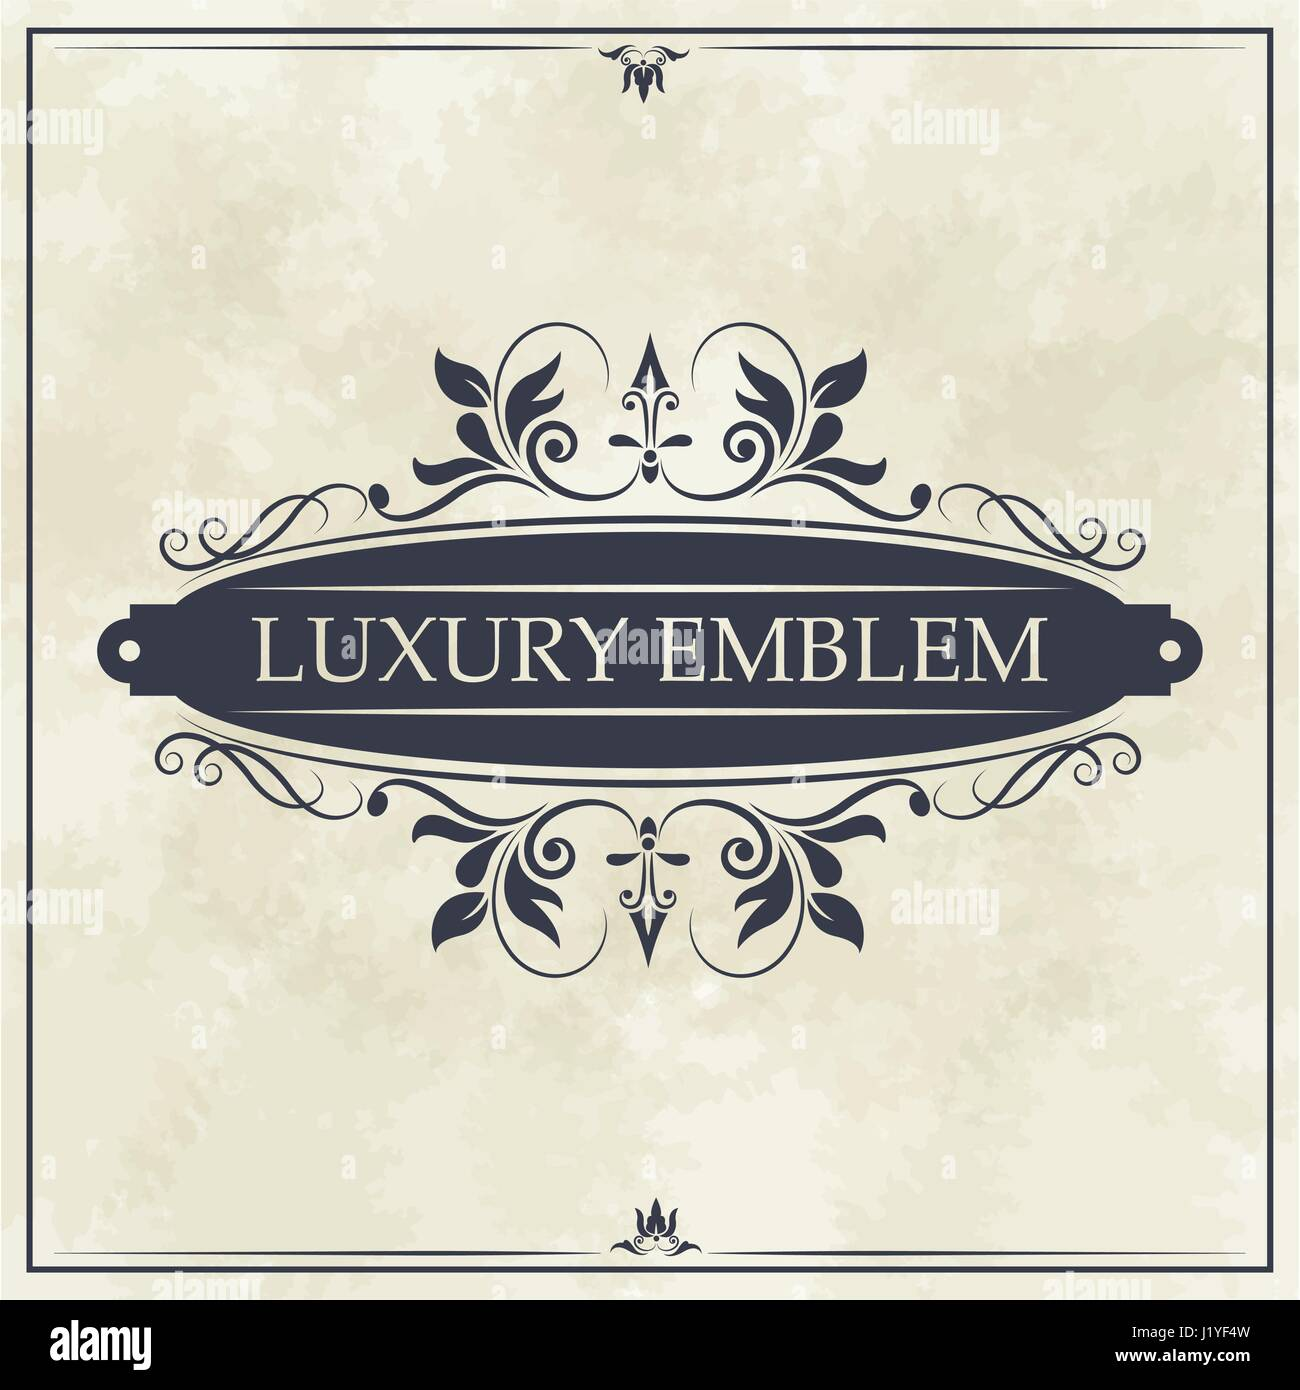 luxury emblem swirl ornament typographic design - Stock Image